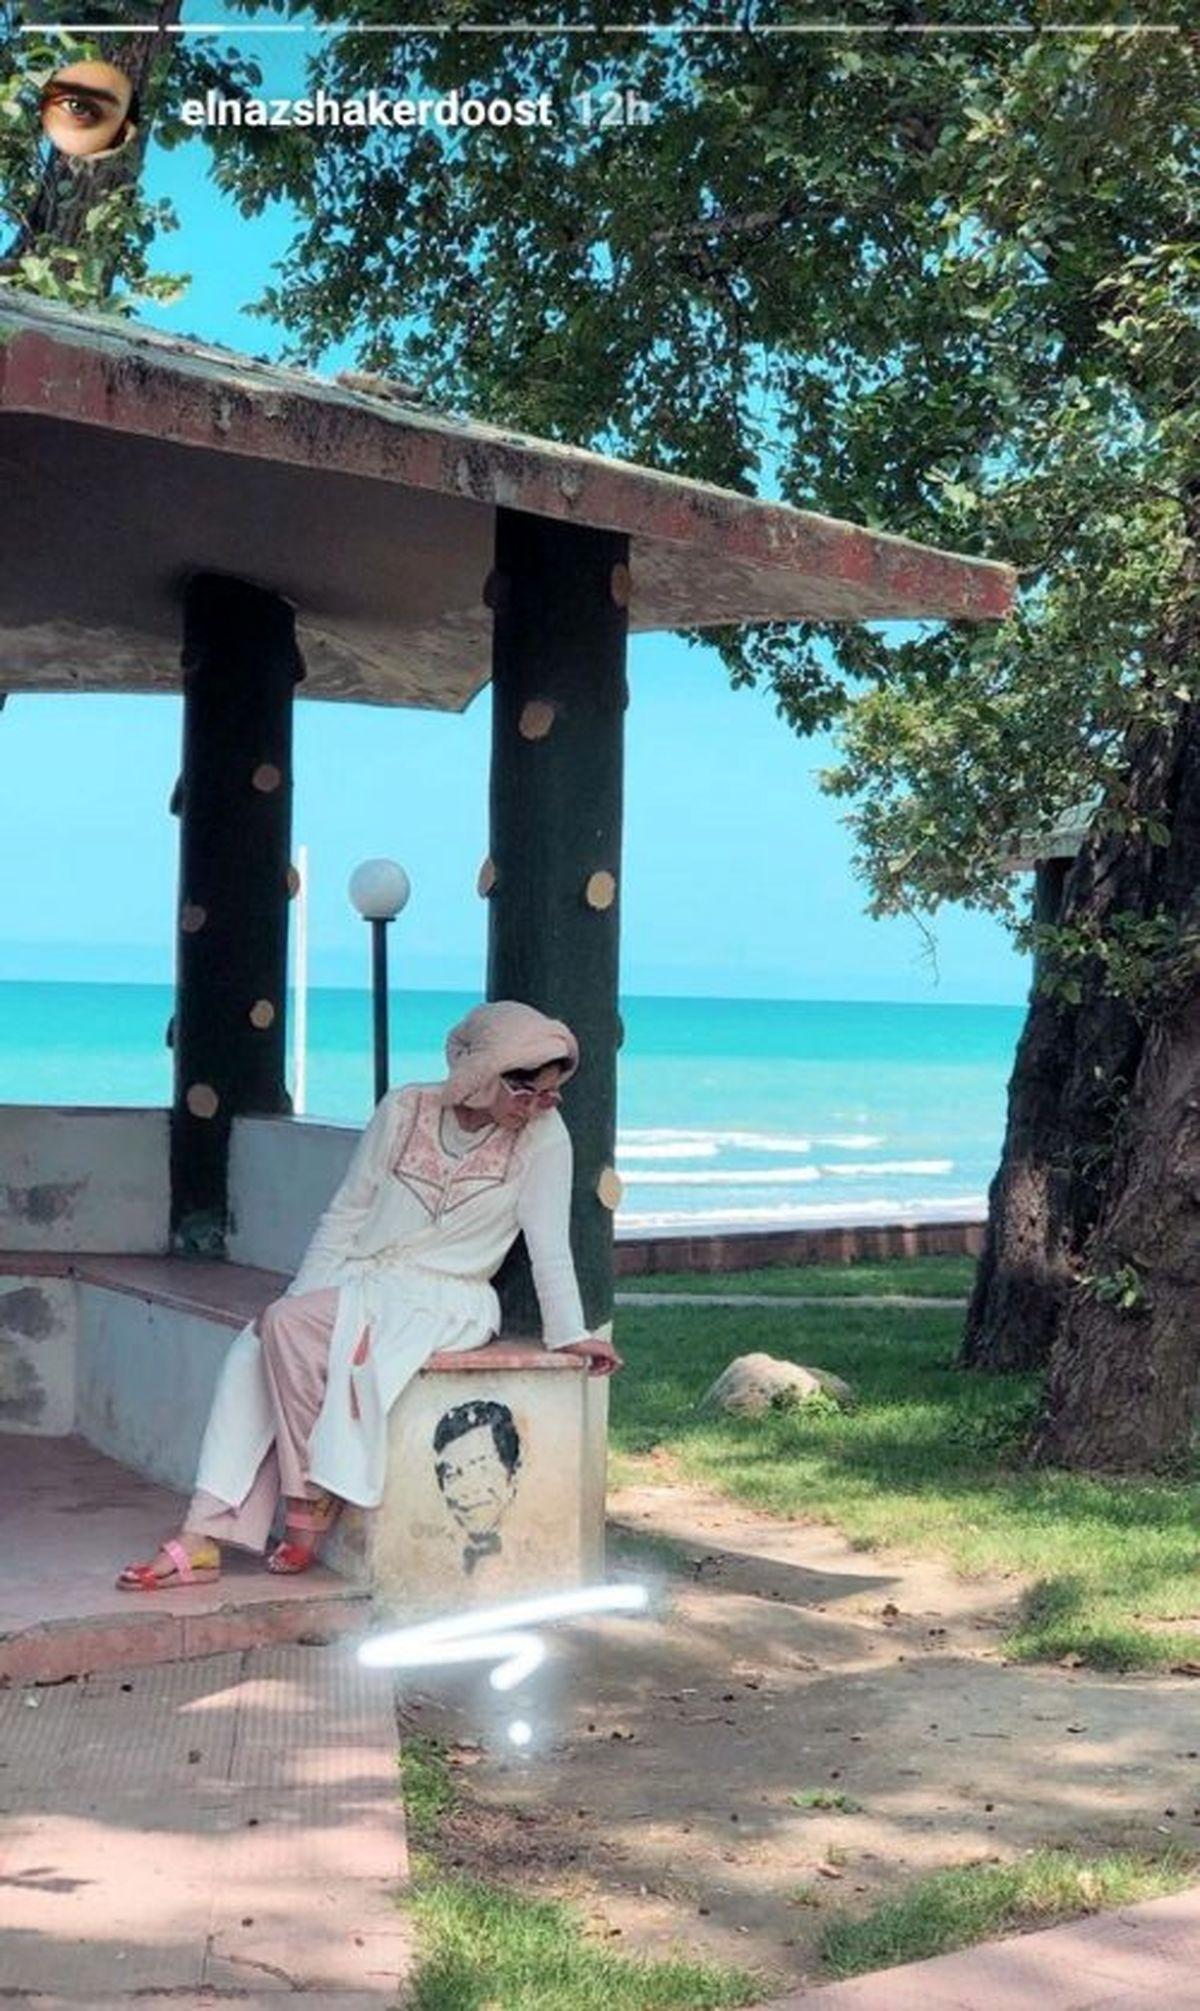 پاهای عریان الناز شاکردوست لب ساحل/ لاک رنگی رنگی الناز شاکردوست+عکس